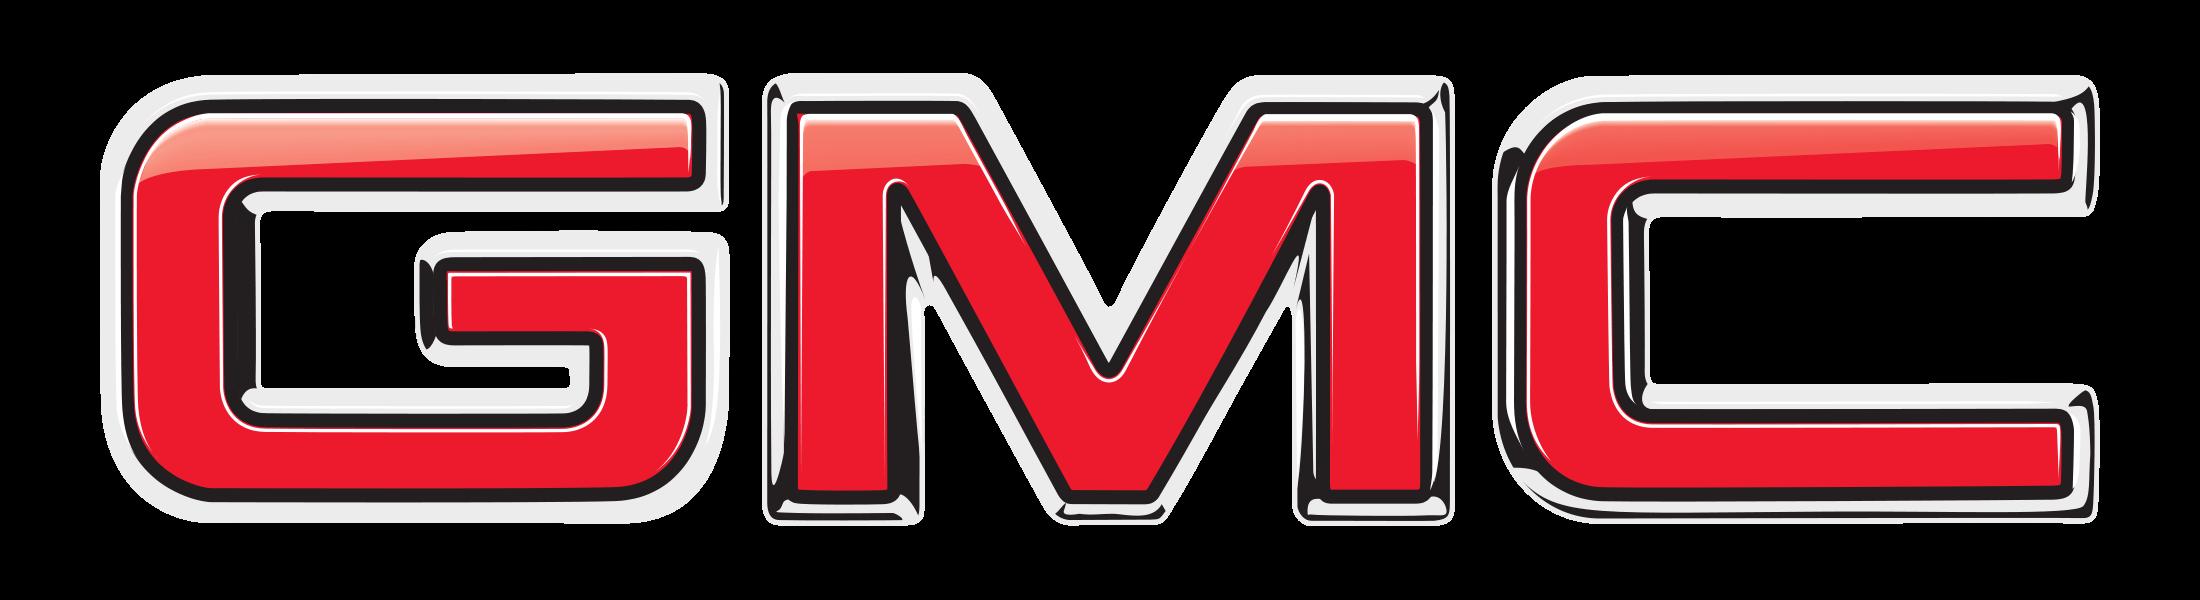 http://rpmautolease.com/wp-content/uploads/2017/08/GMC-logo-2200x600.png